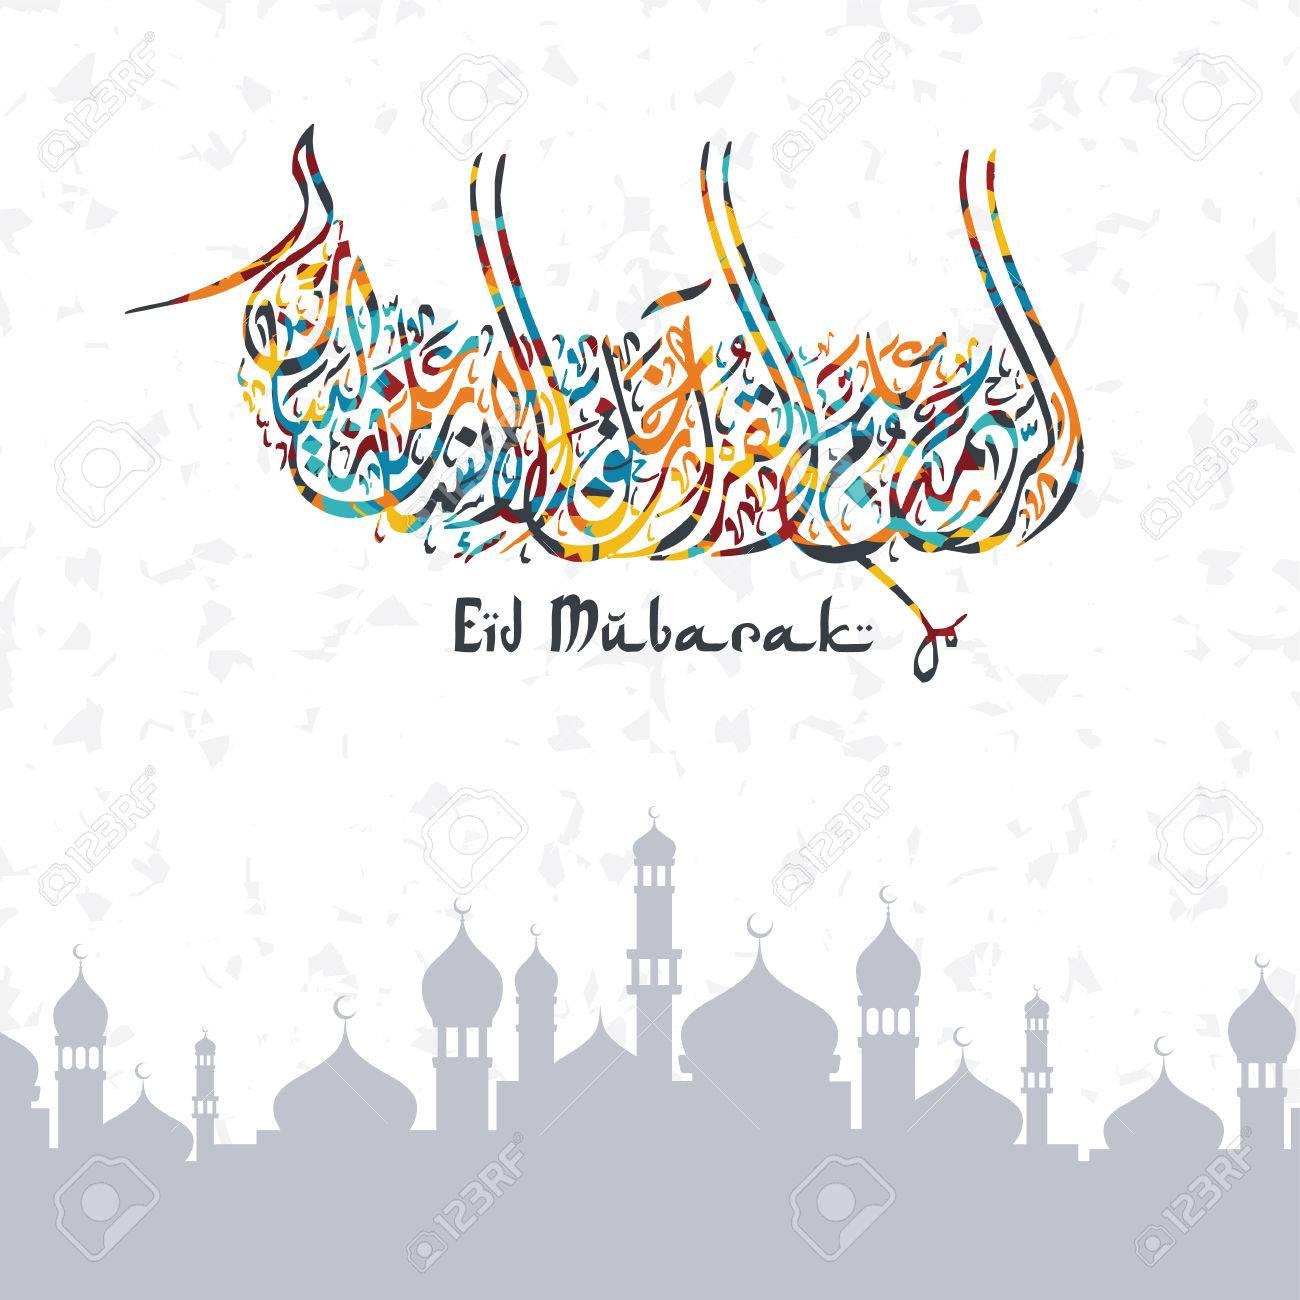 Happy eid mubarak greetings arabic calligraphy art theme vector happy eid mubarak greetings arabic calligraphy art theme vector illustration stock vector 58160618 m4hsunfo